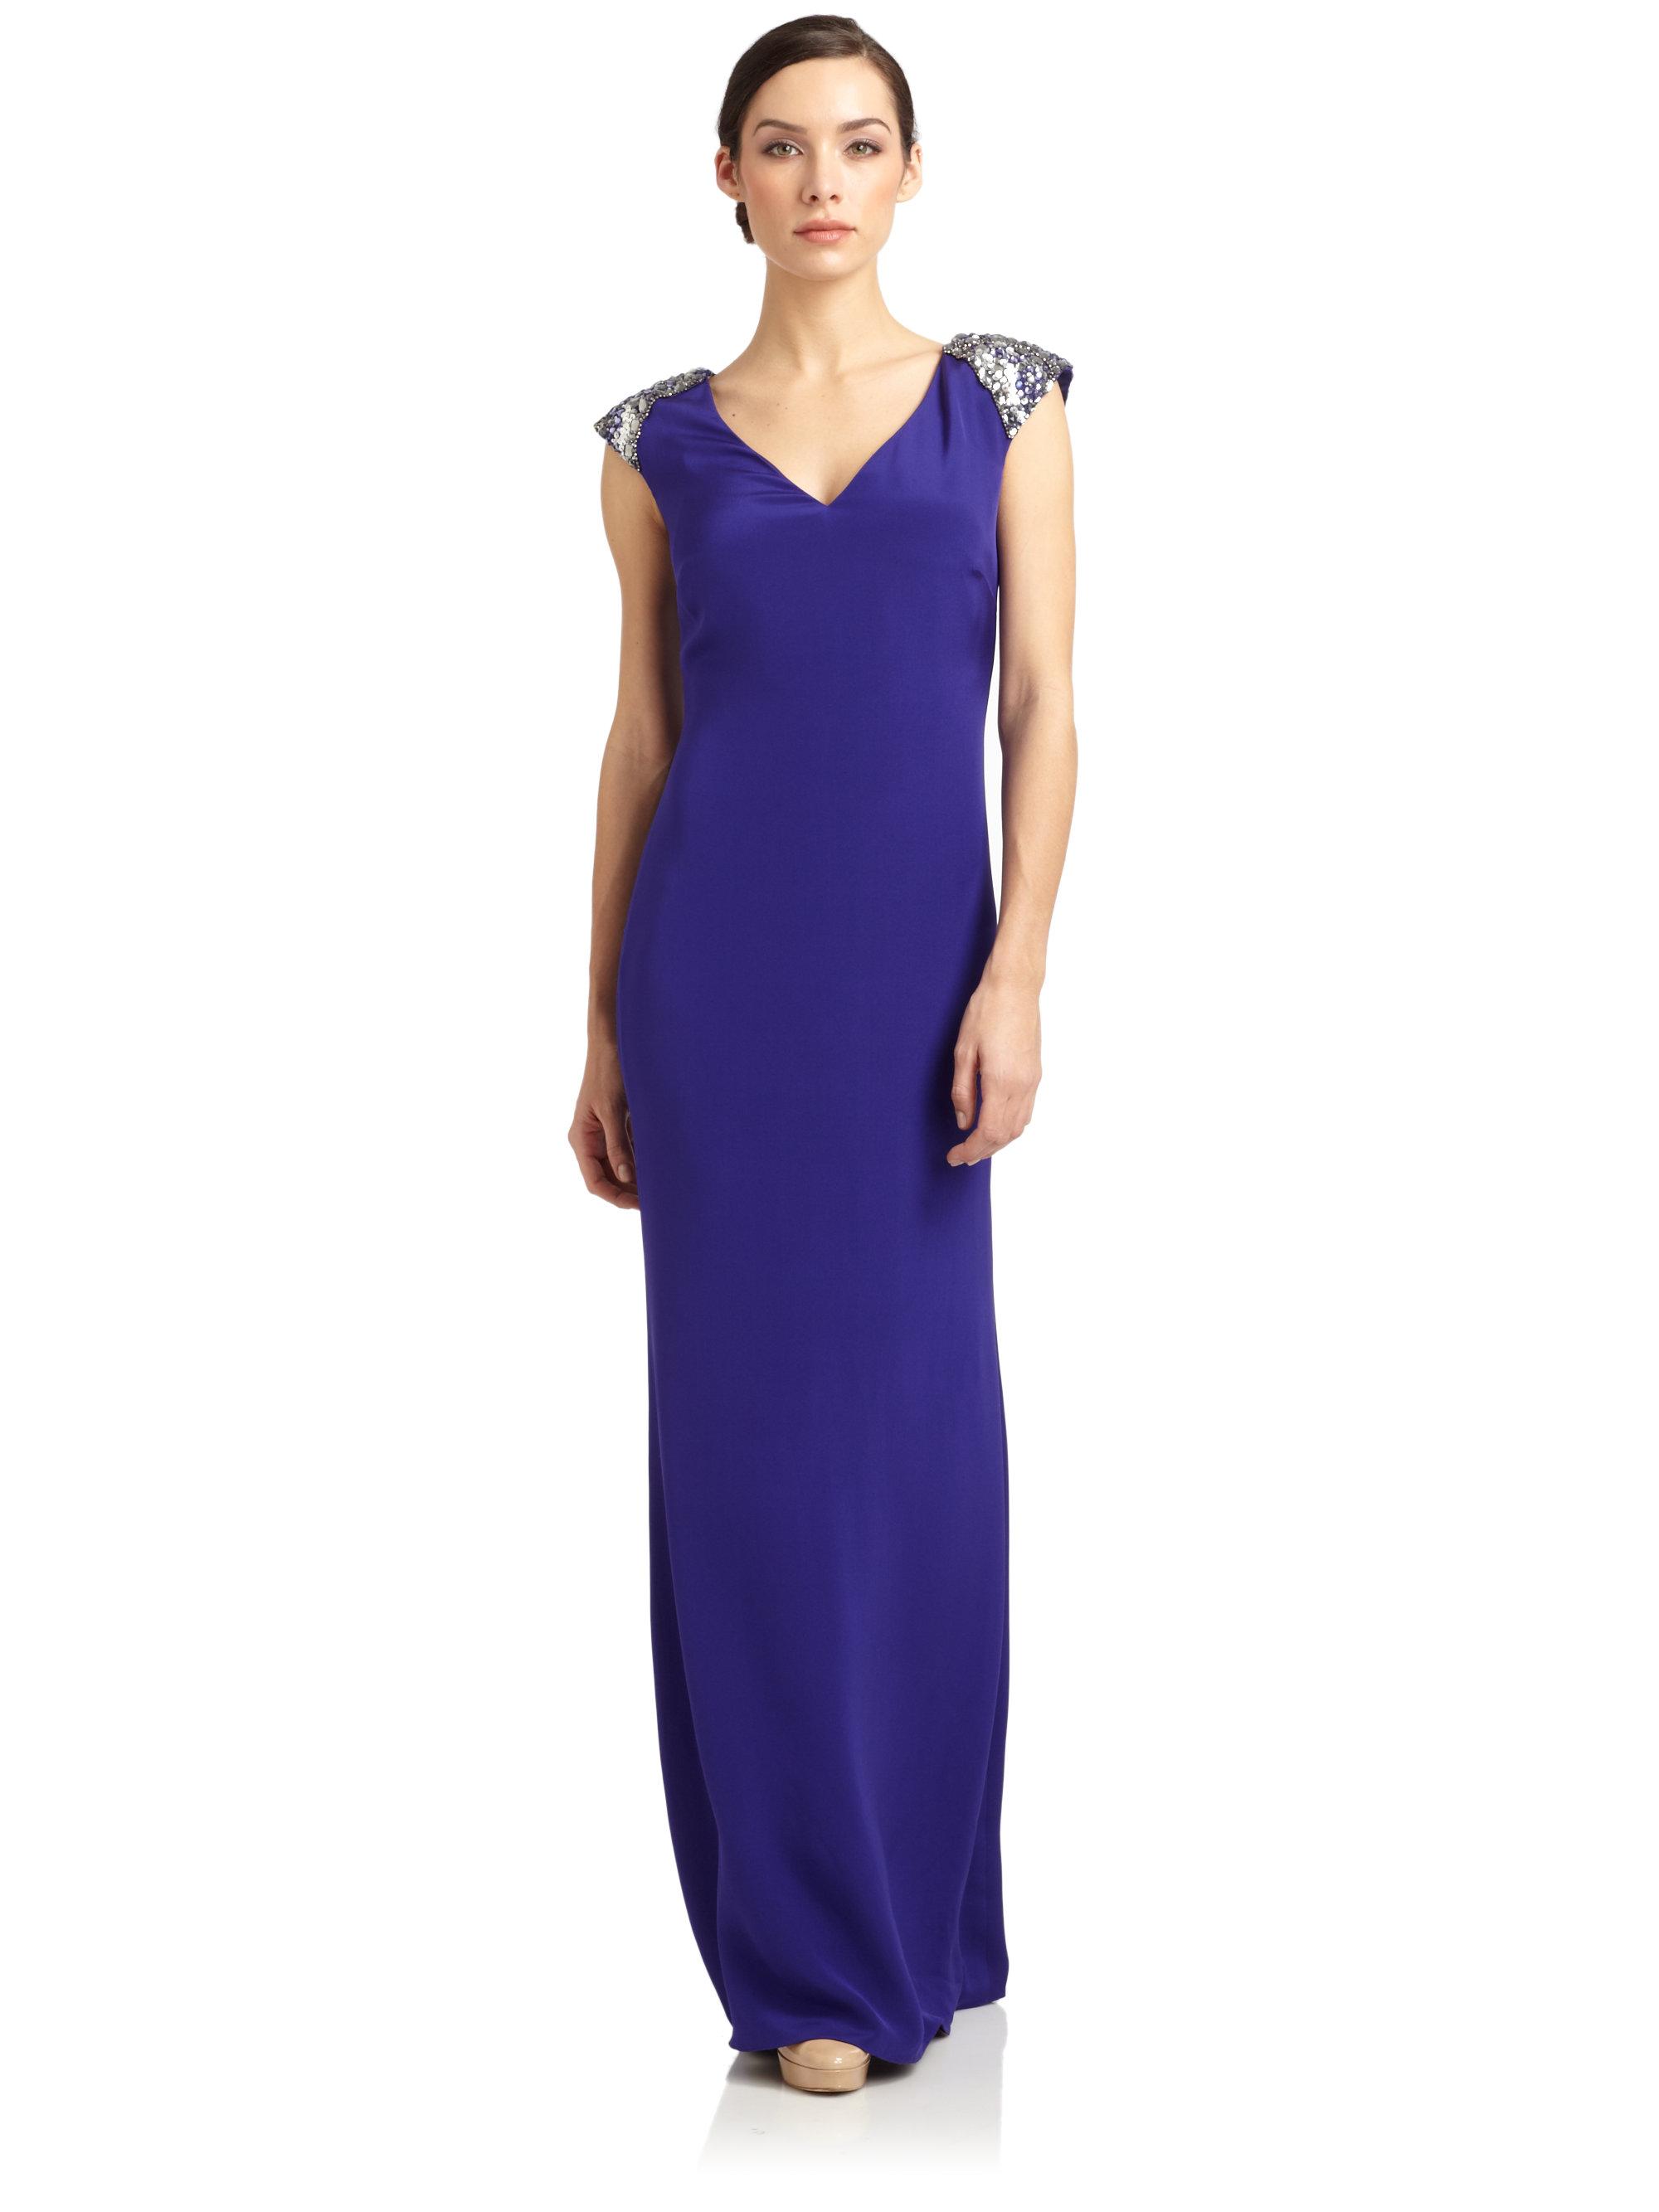 21187ac03fa notte-by-marchesa-bristol-embellished-silk-column-dress -product-1-7985745-694306389.jpeg